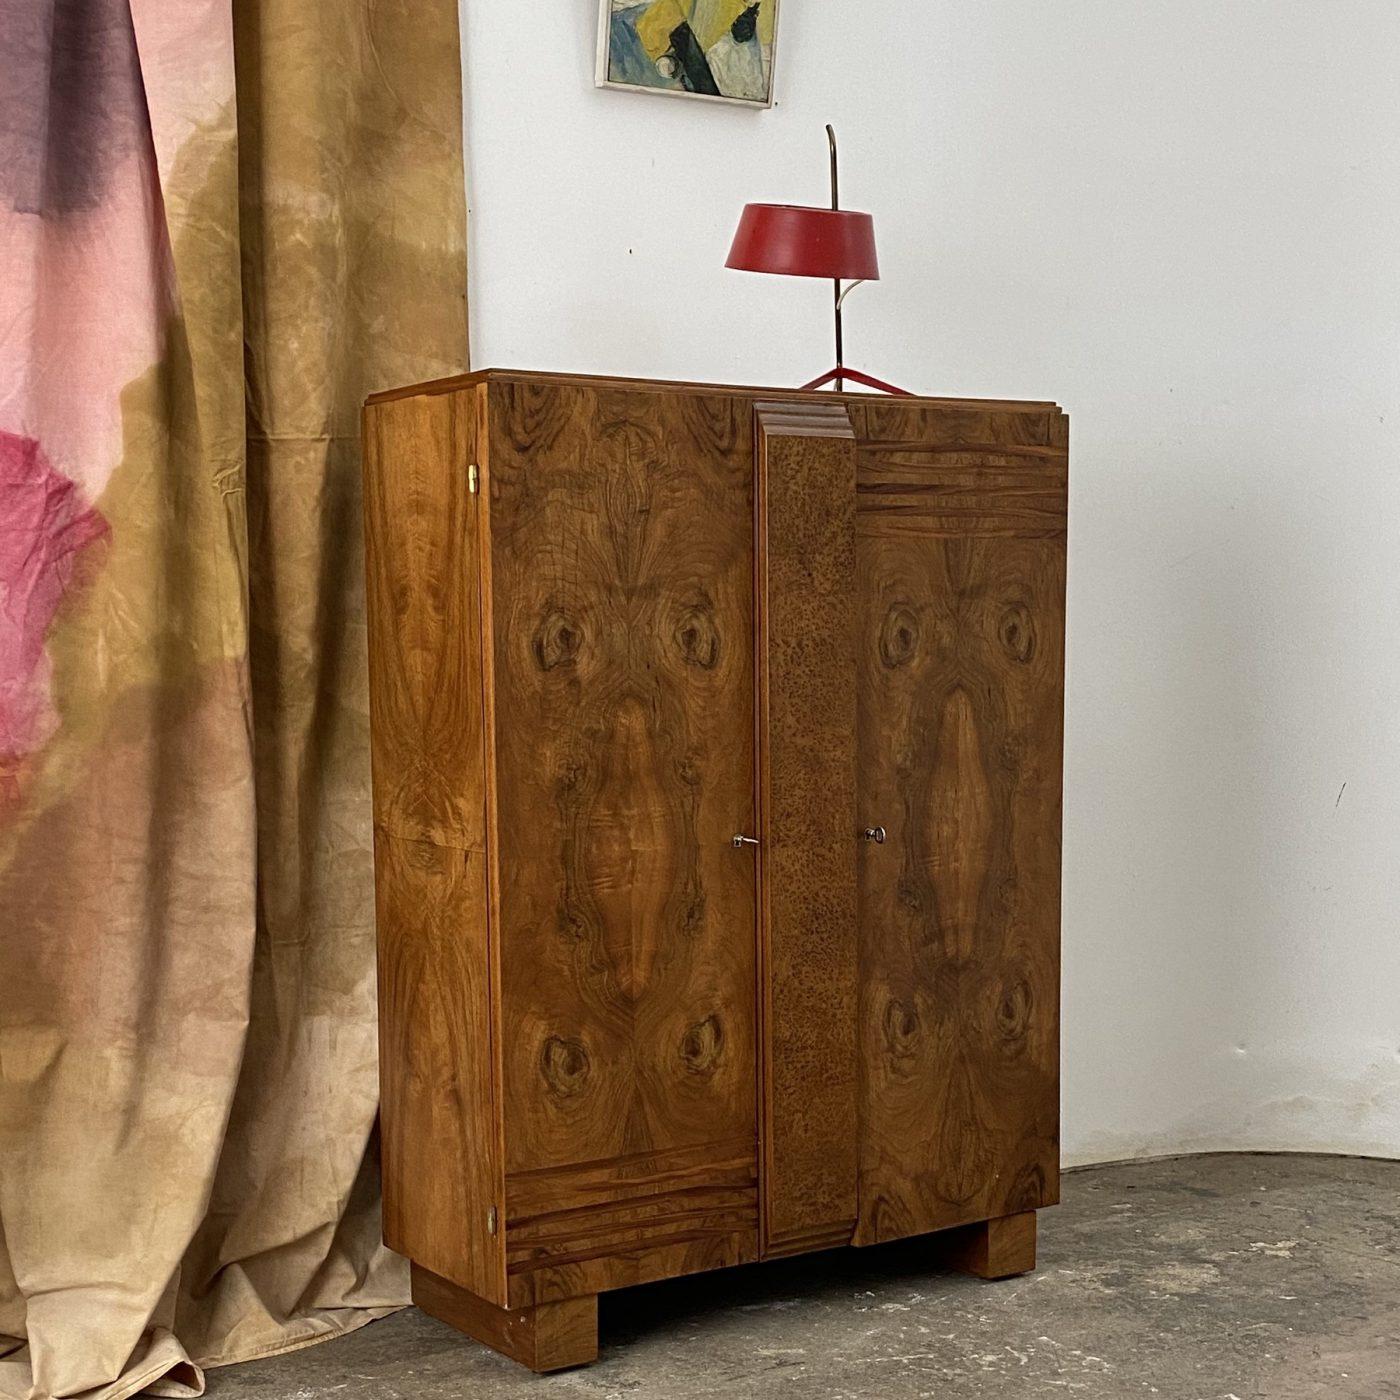 objet-vagabond-artdeco-cabinet0004